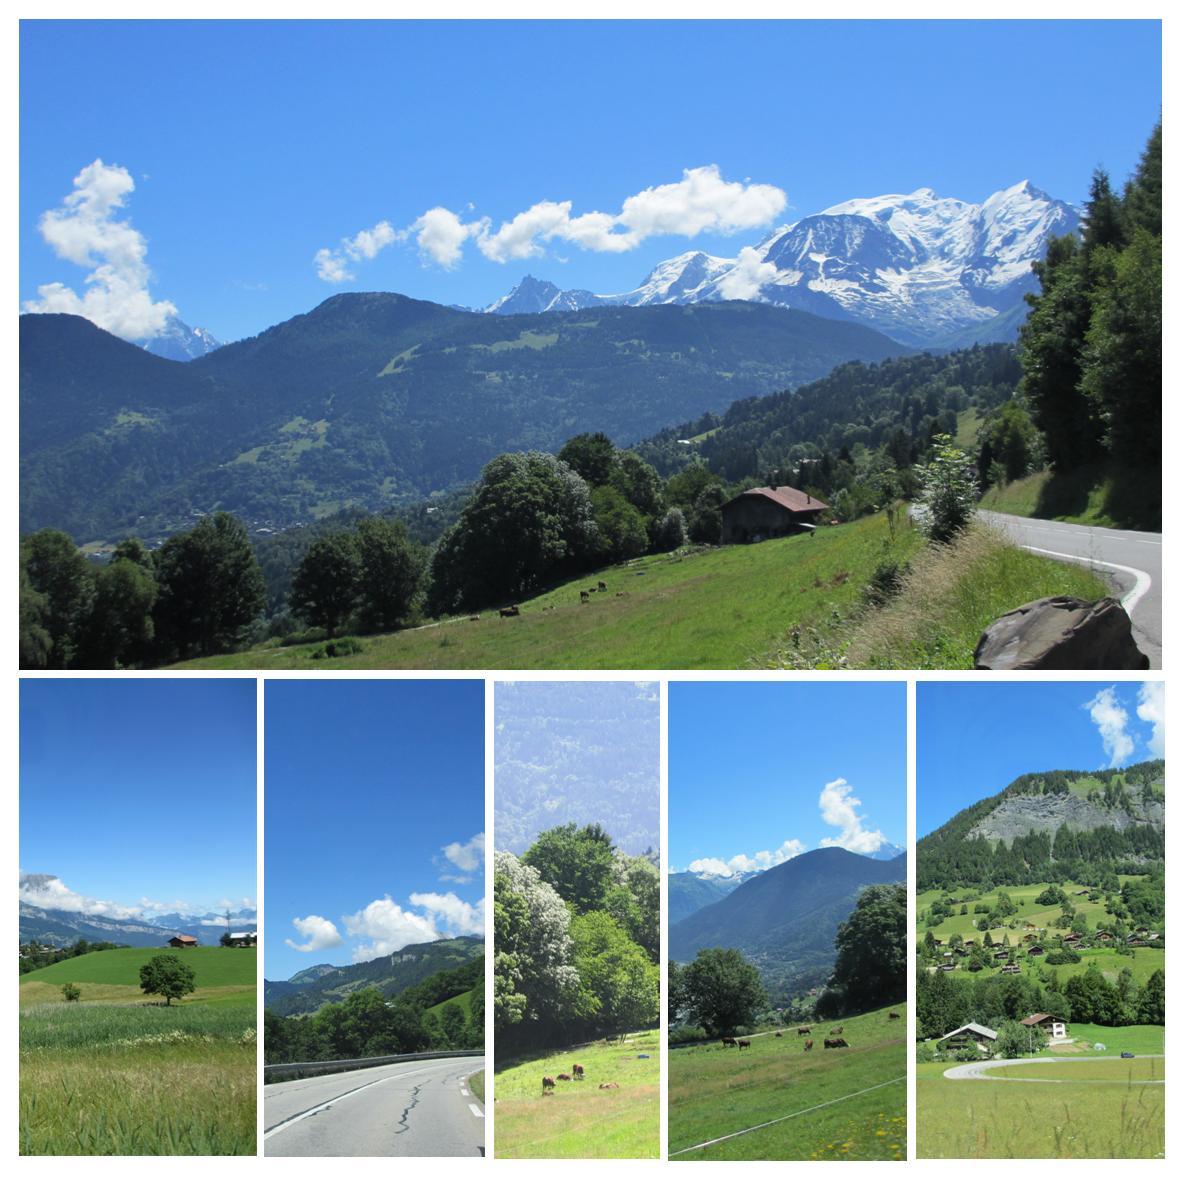 Bilferie franske alper - mont blanc